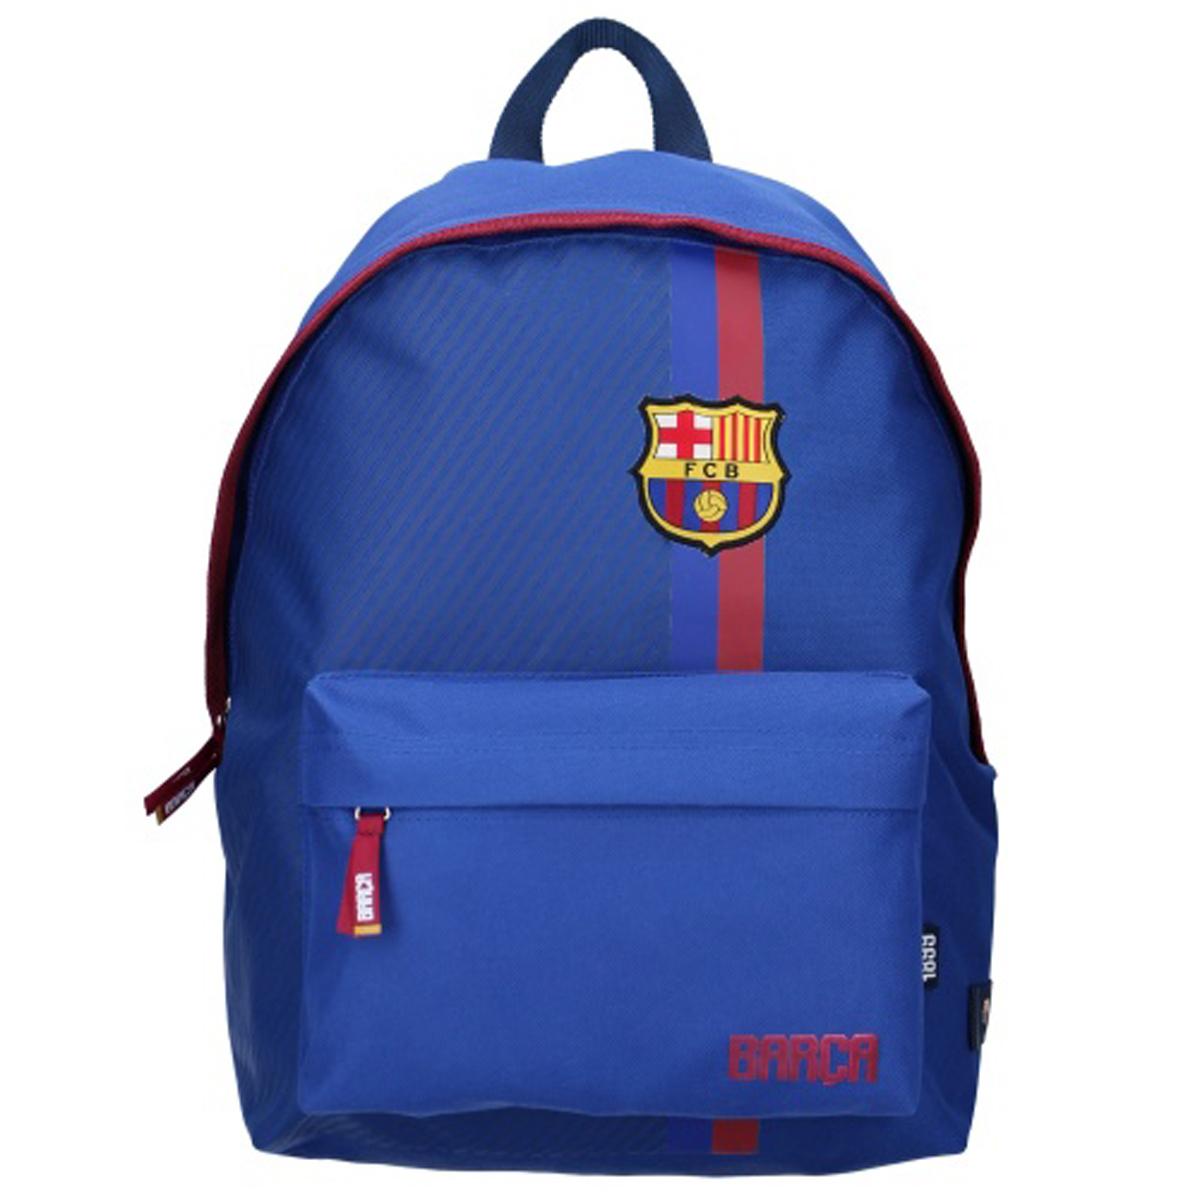 Sac à dos \'FC Barcelona\' bleu rouge - 40x30x14 cm - [Q8695]